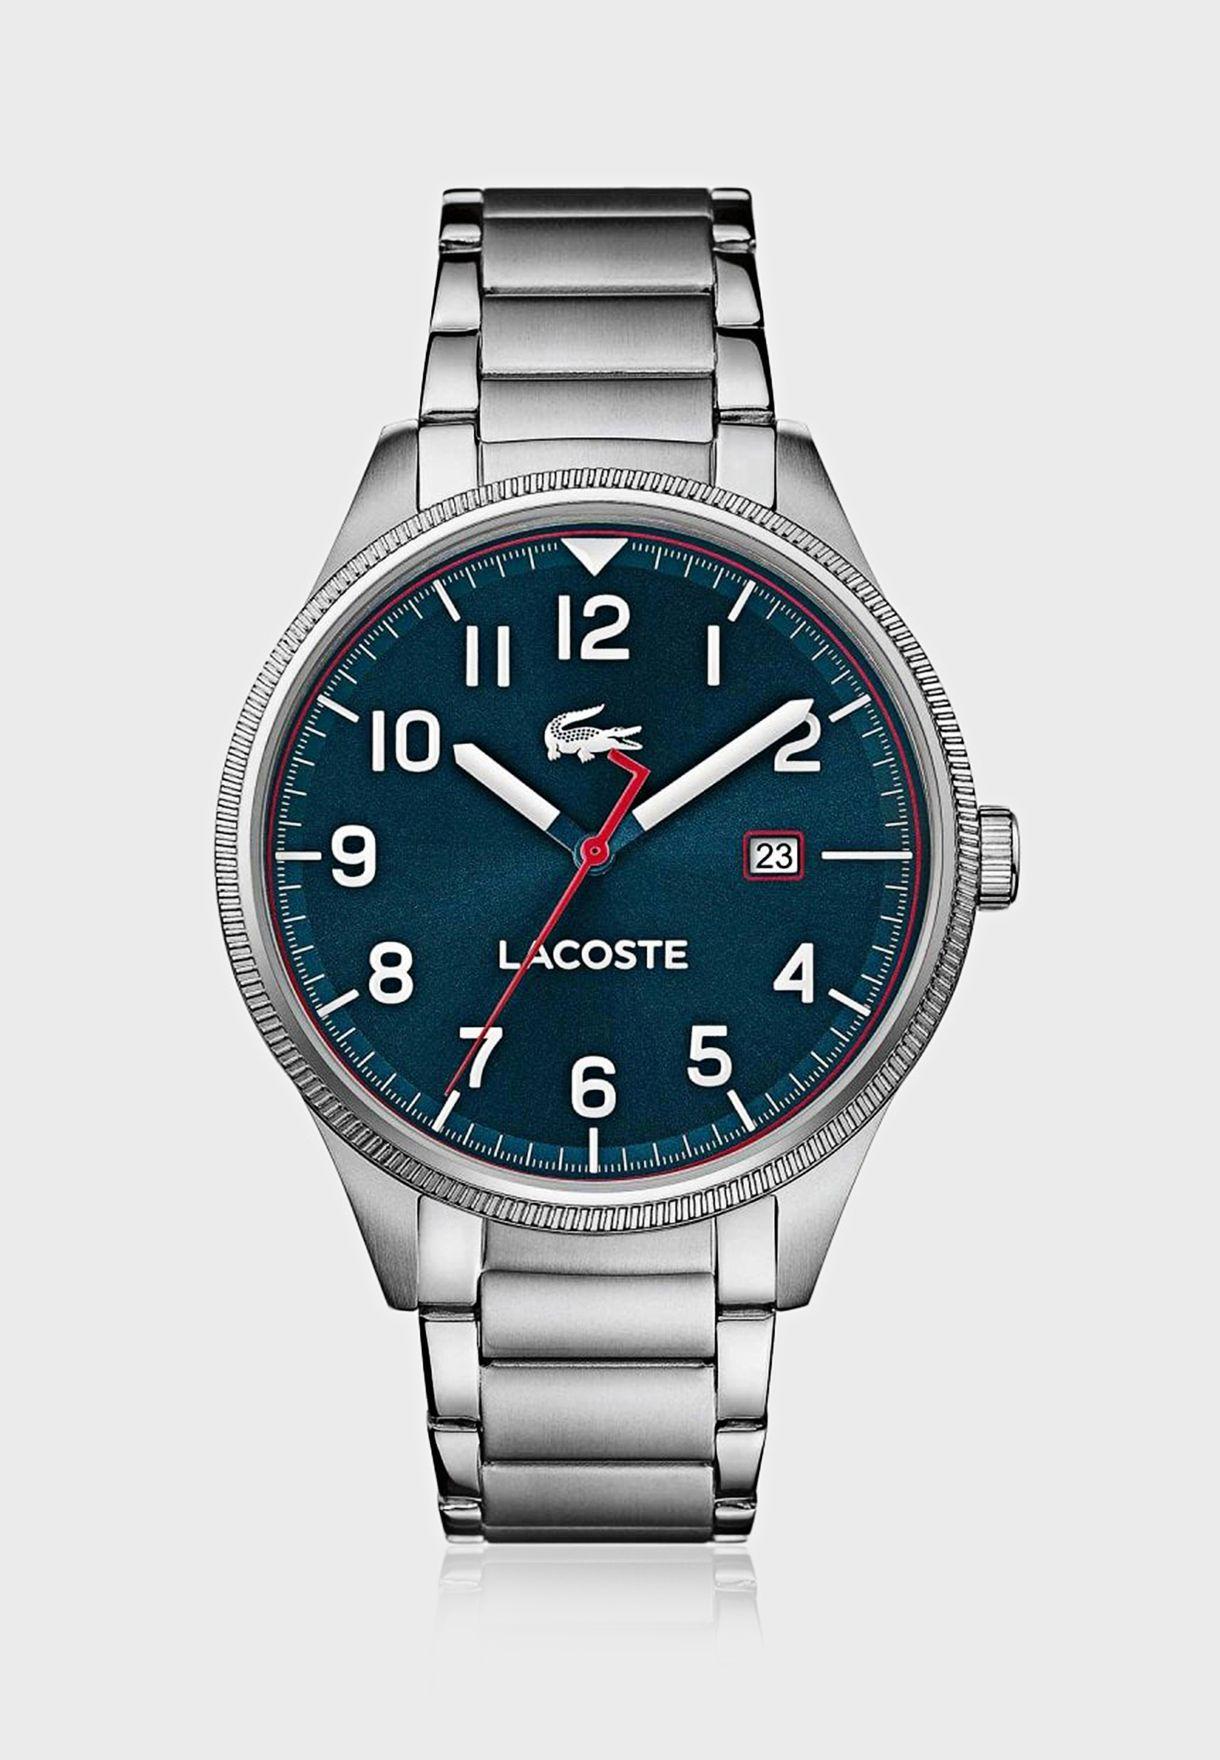 2011022 Steel Strap Analog Watch